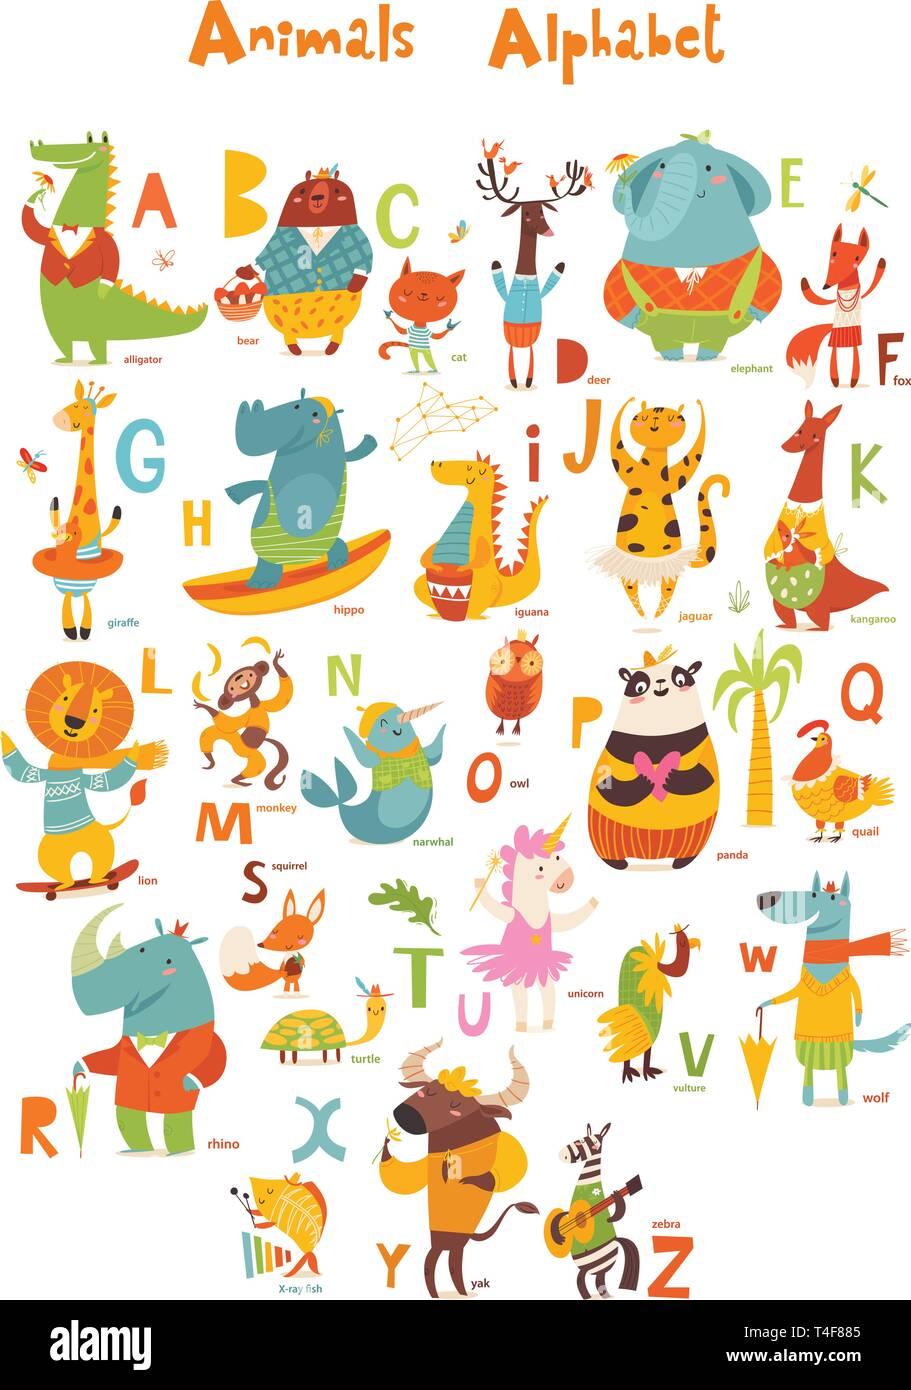 alphabet with animals stock vector.html